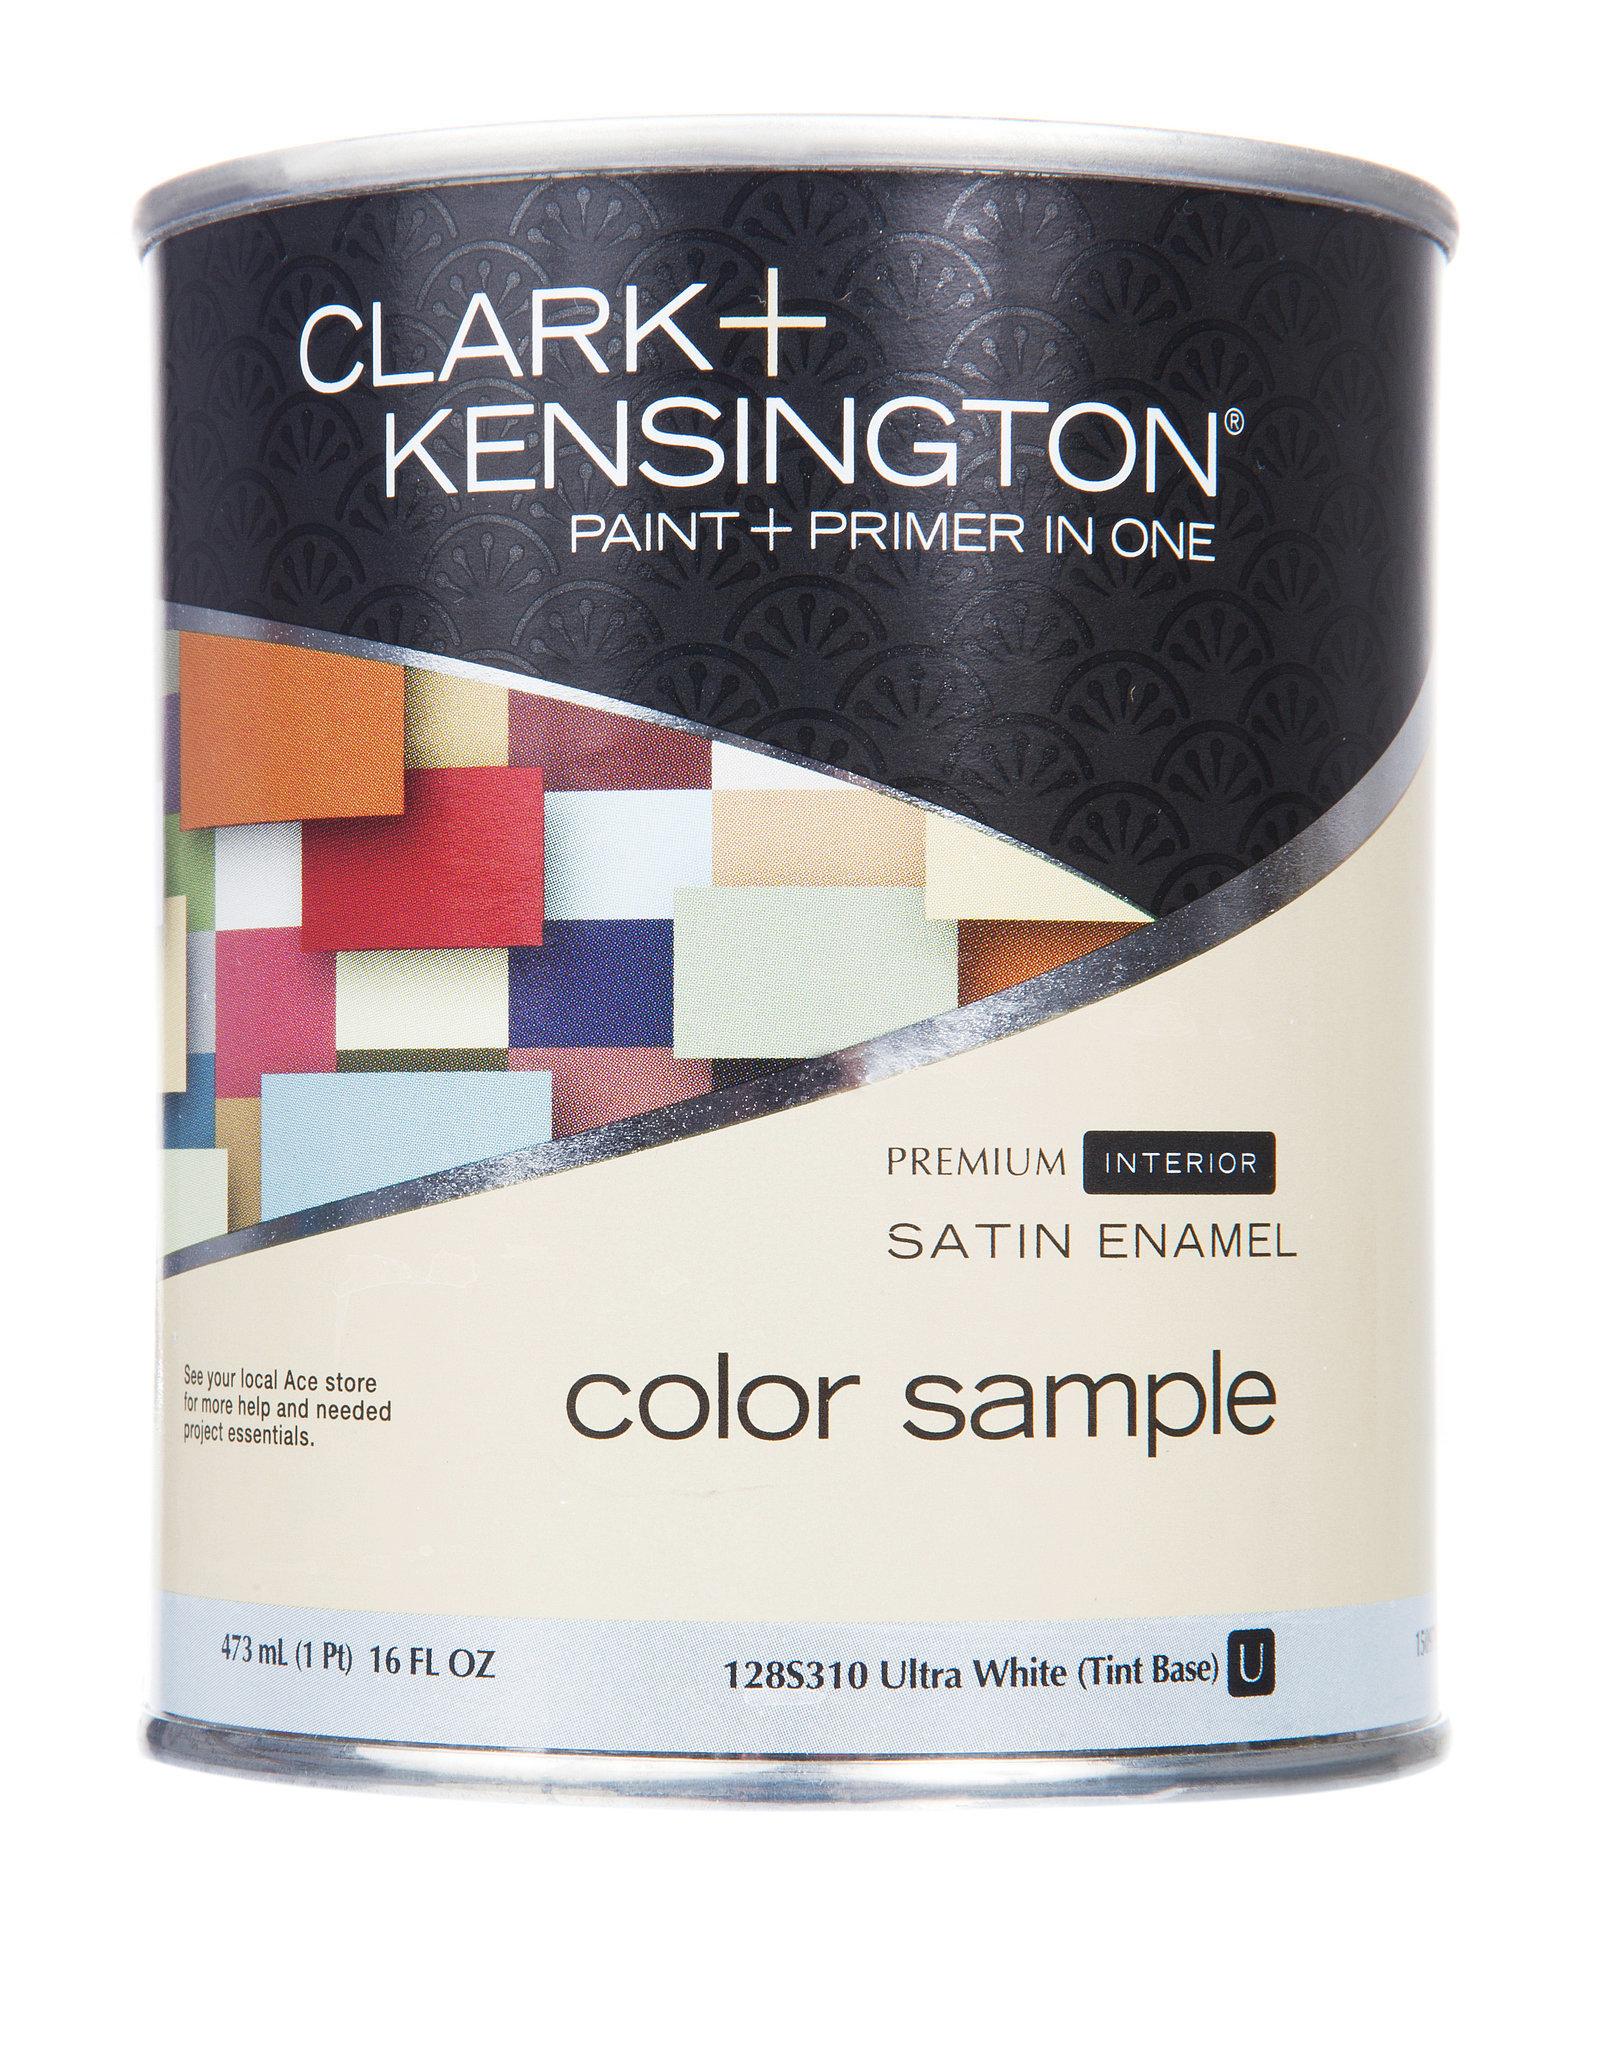 OPI and Clark+Kensington Paint Pint Sample